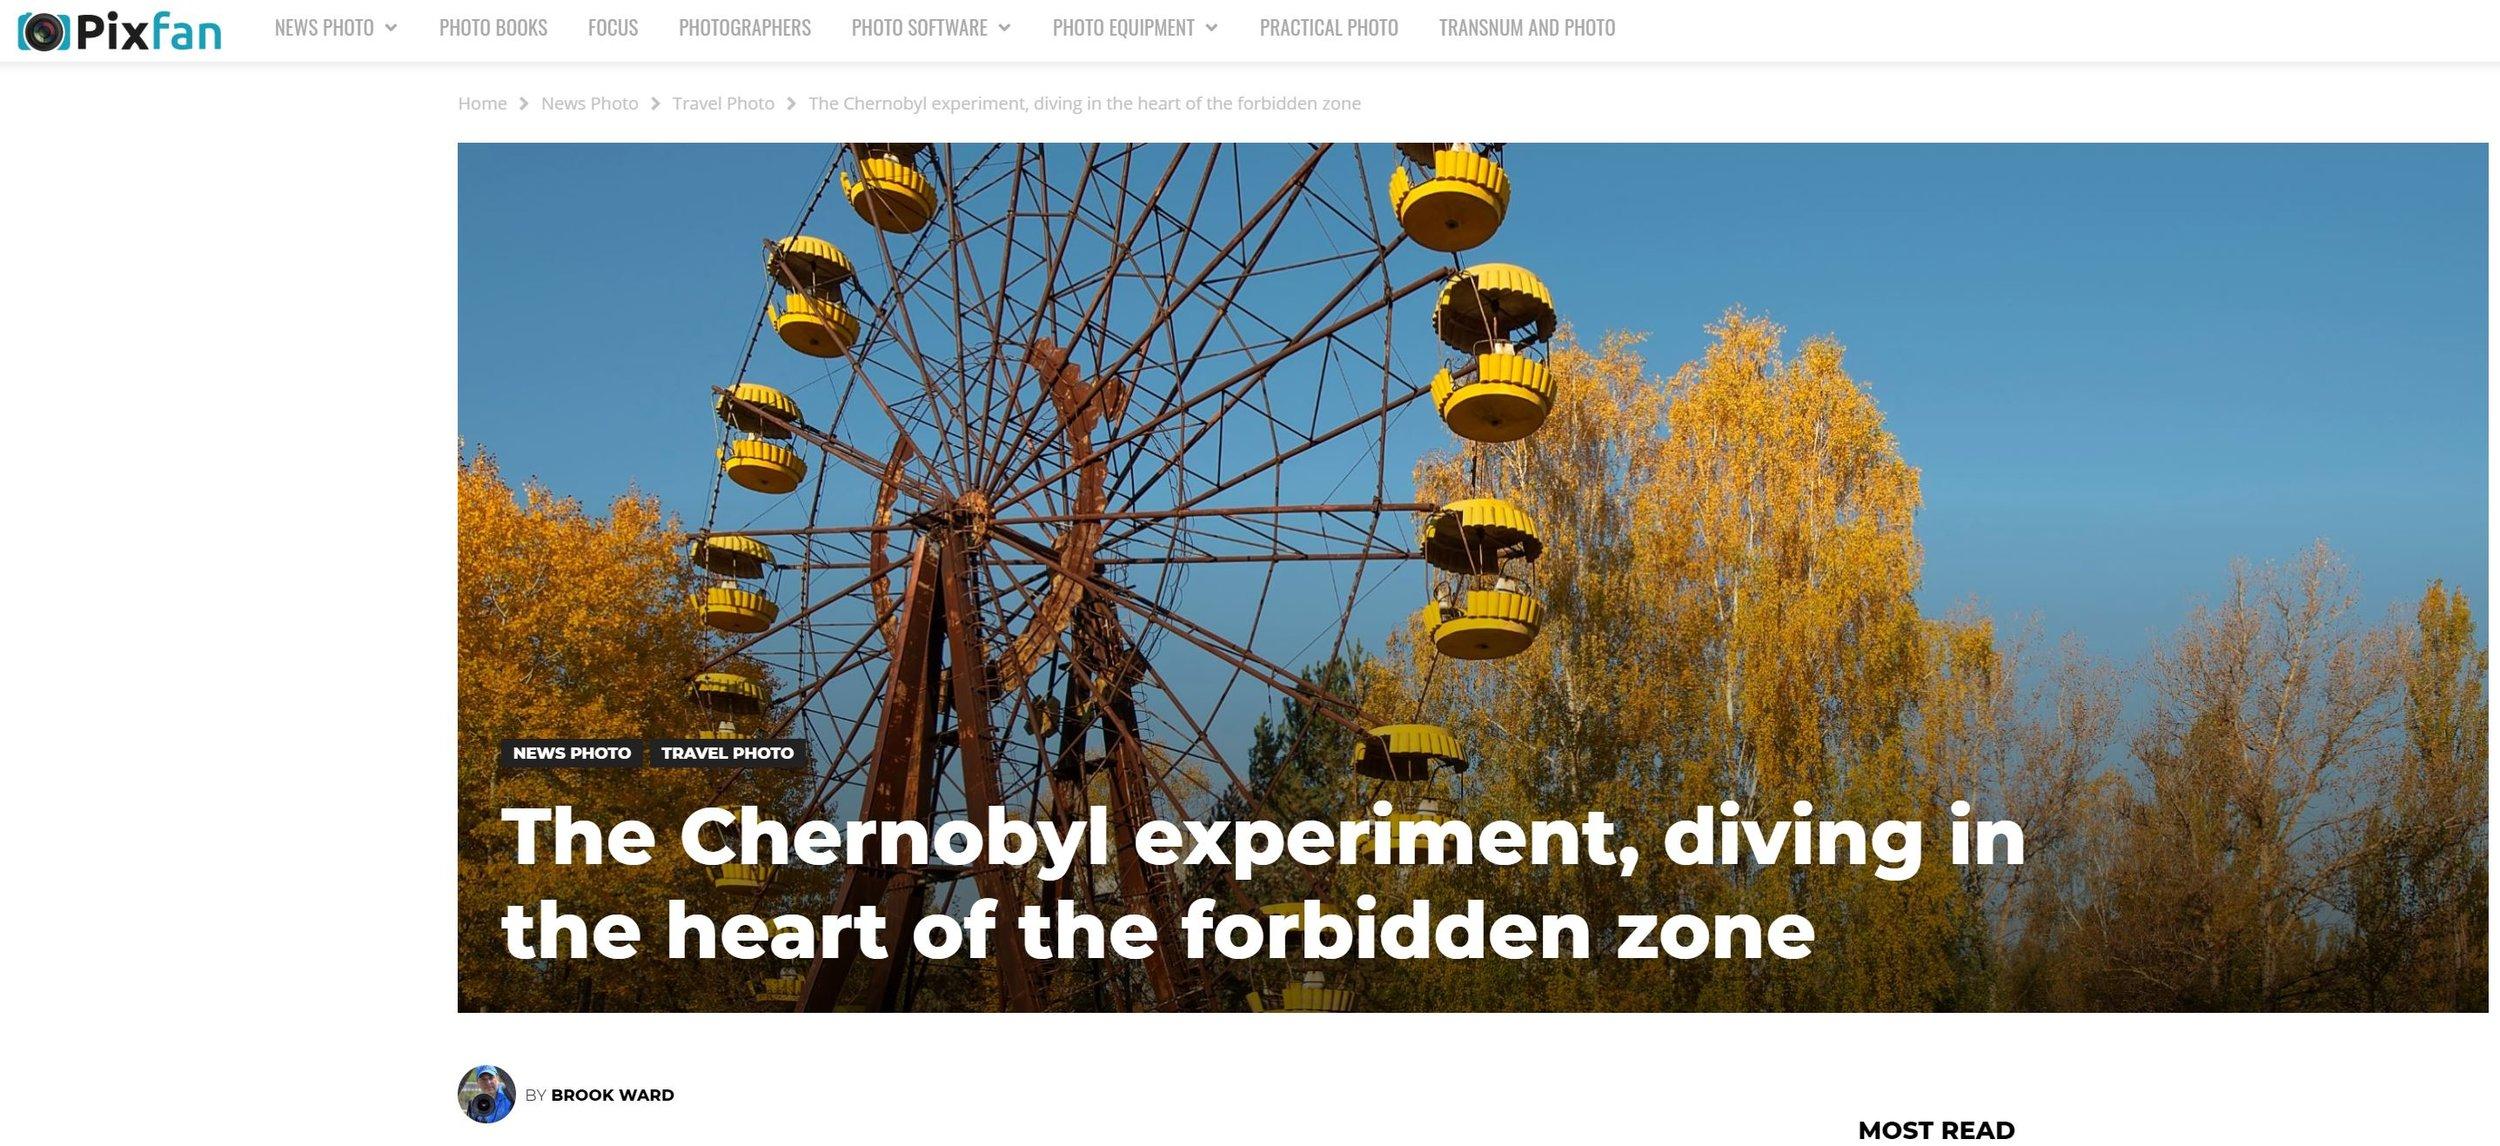 PixFan-com Chernobyl Artilce 2019.JPG